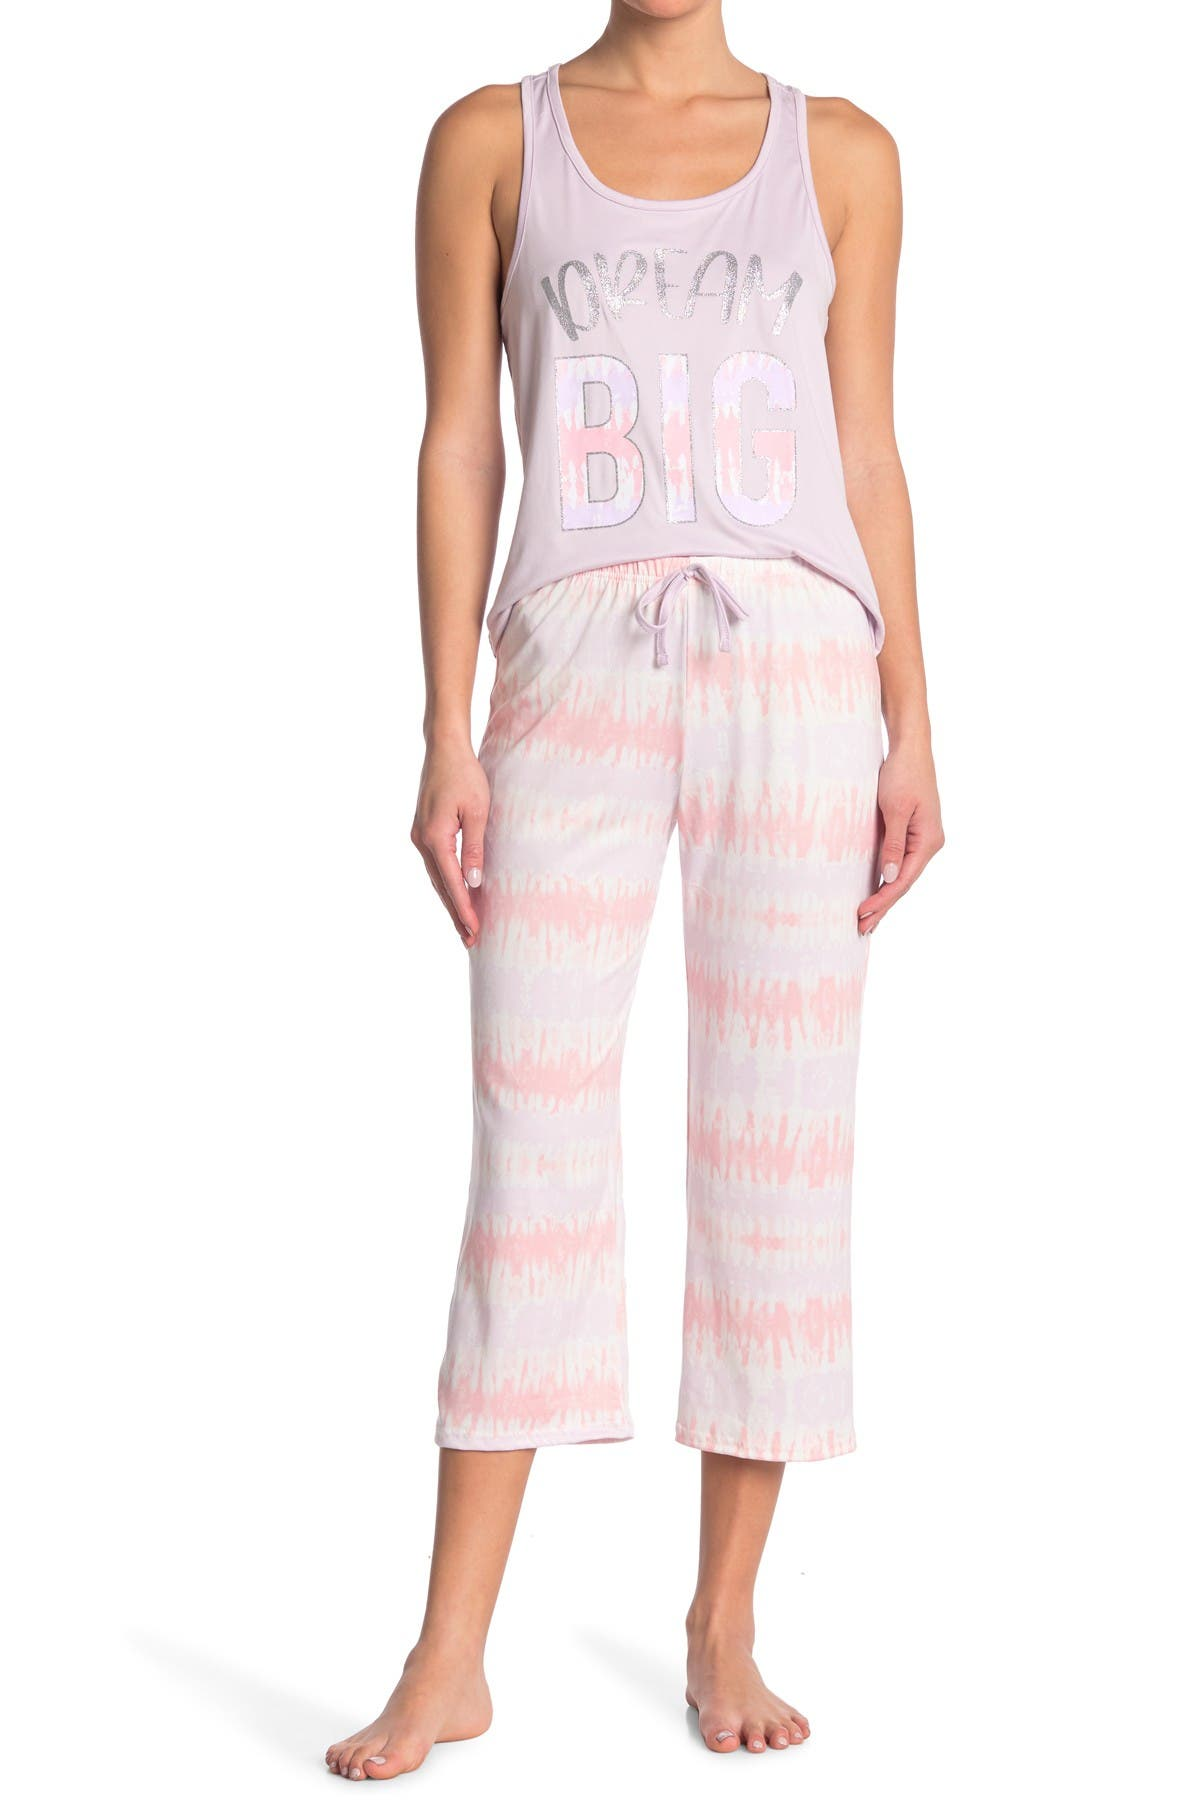 Image of FRENCH AFFAIR Dream Big Tie Dye Tank Top & Capri Pants Pajama 2-Piece Set